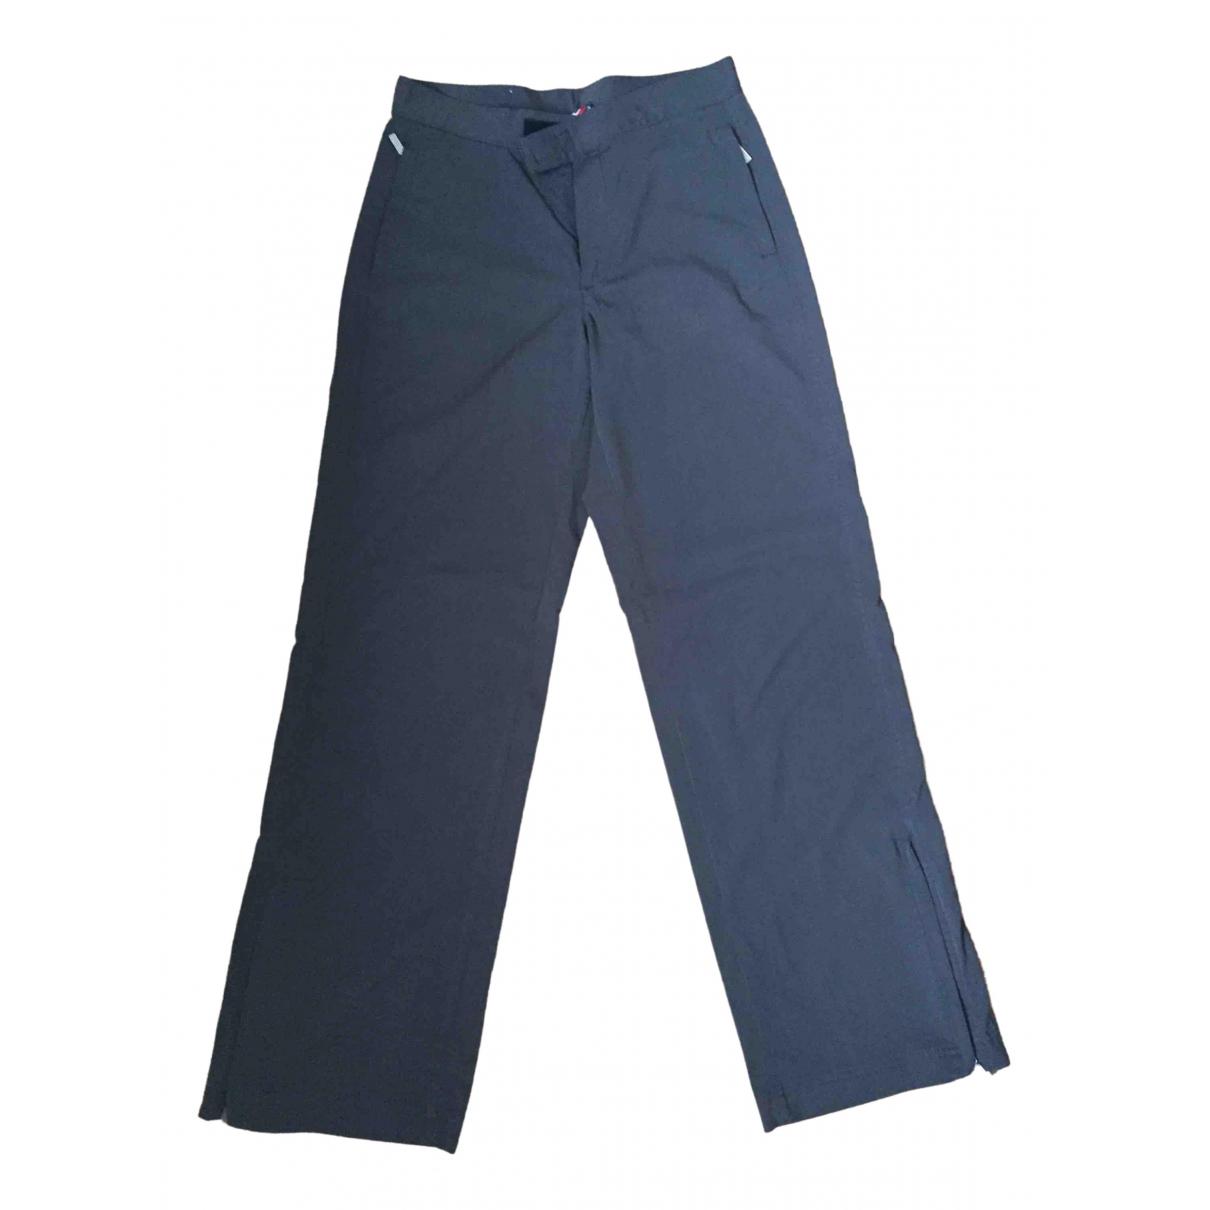 Diesel \N Grey Trousers for Women S International